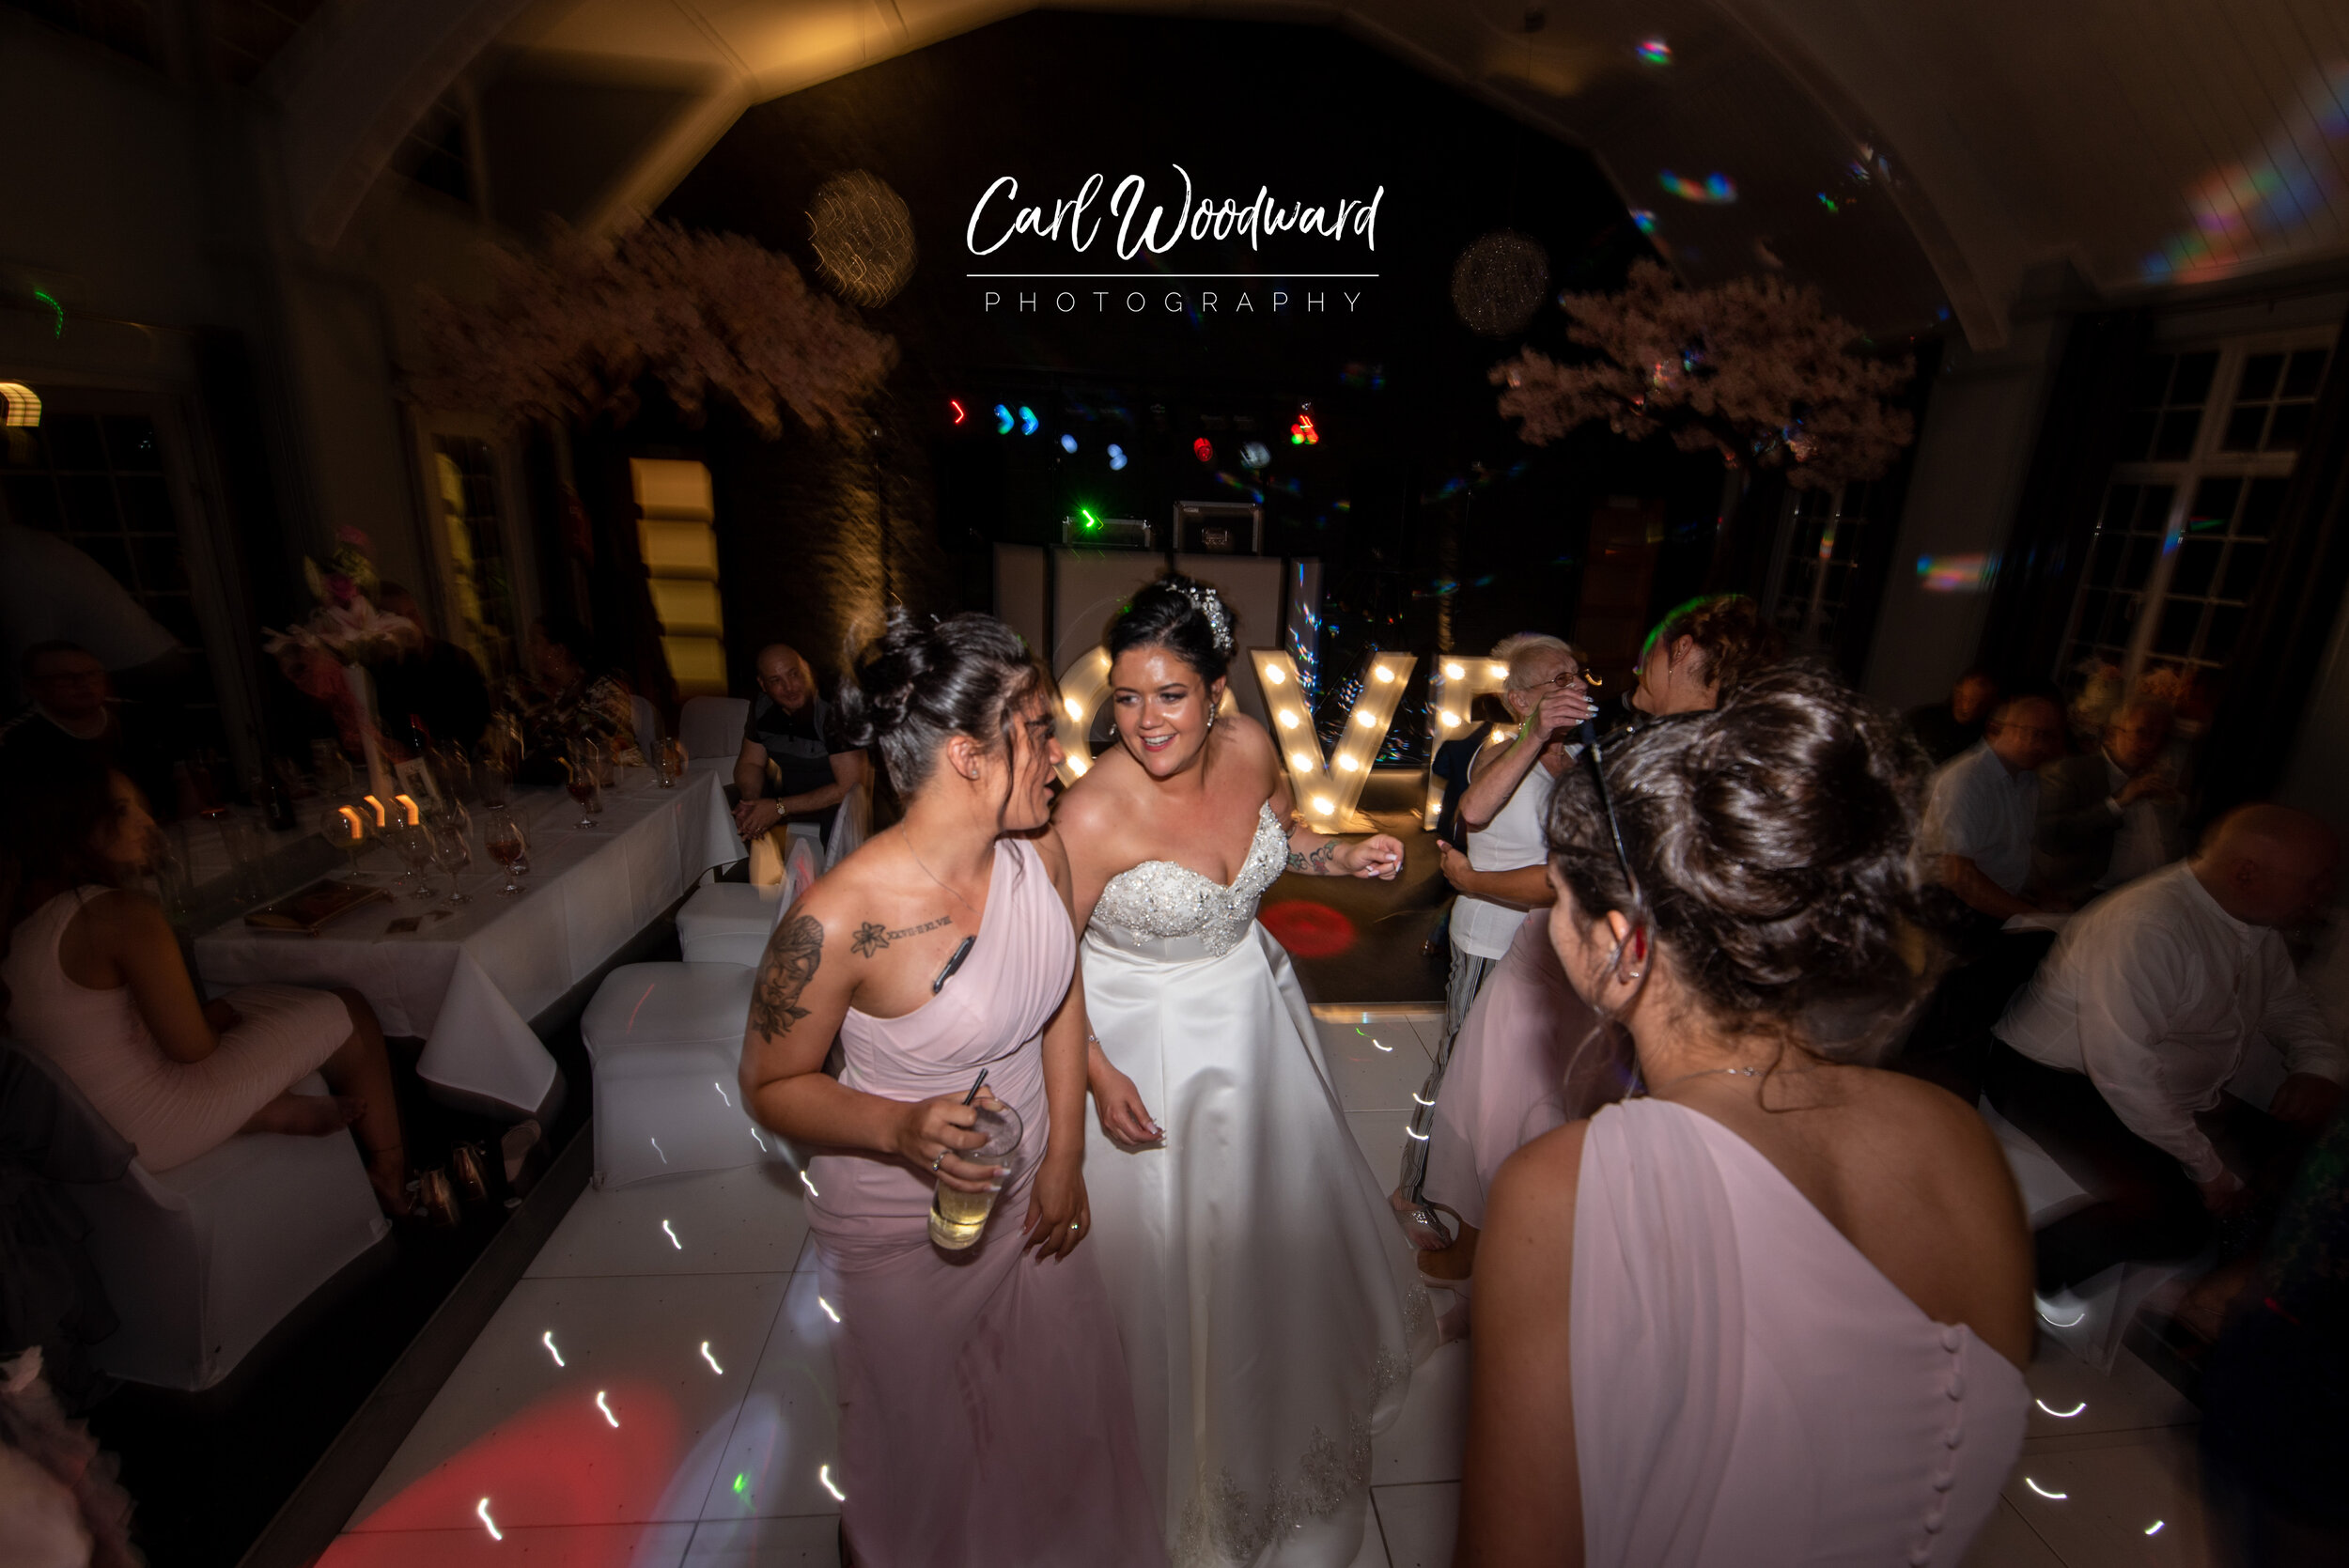 020-The-Holt-Fleet-Wedding-Photos.jpg